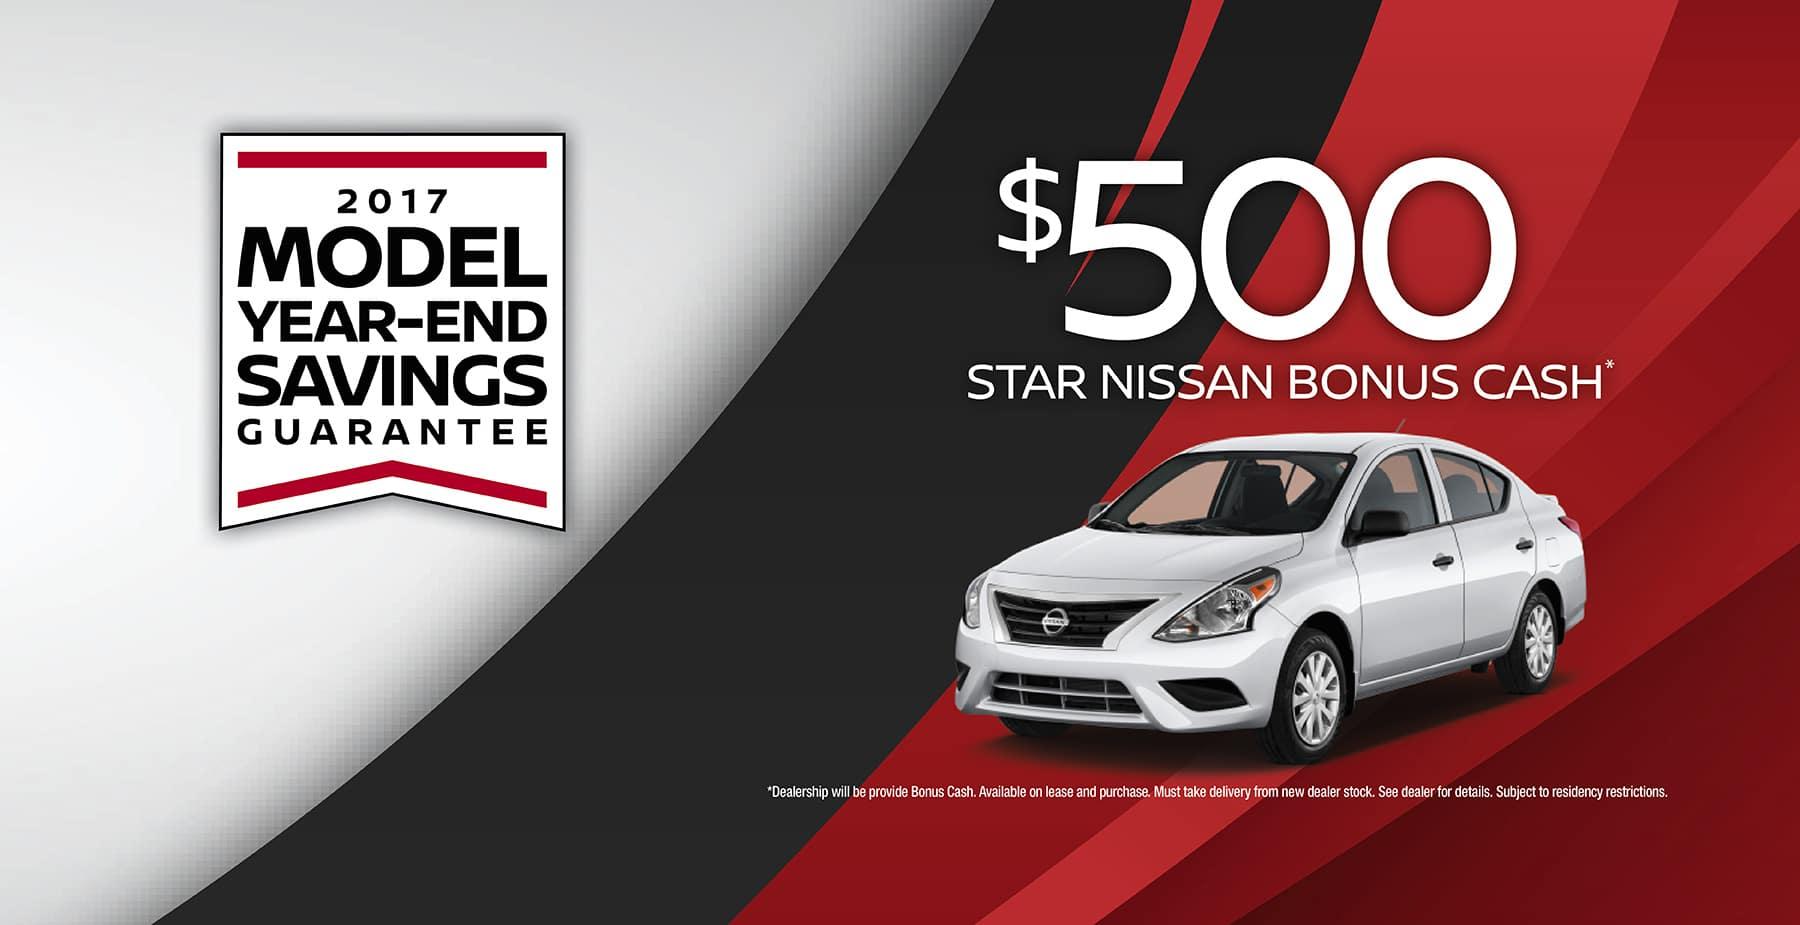 2017 Model Year-End Savings Guarantee and $500 Bonus Cash